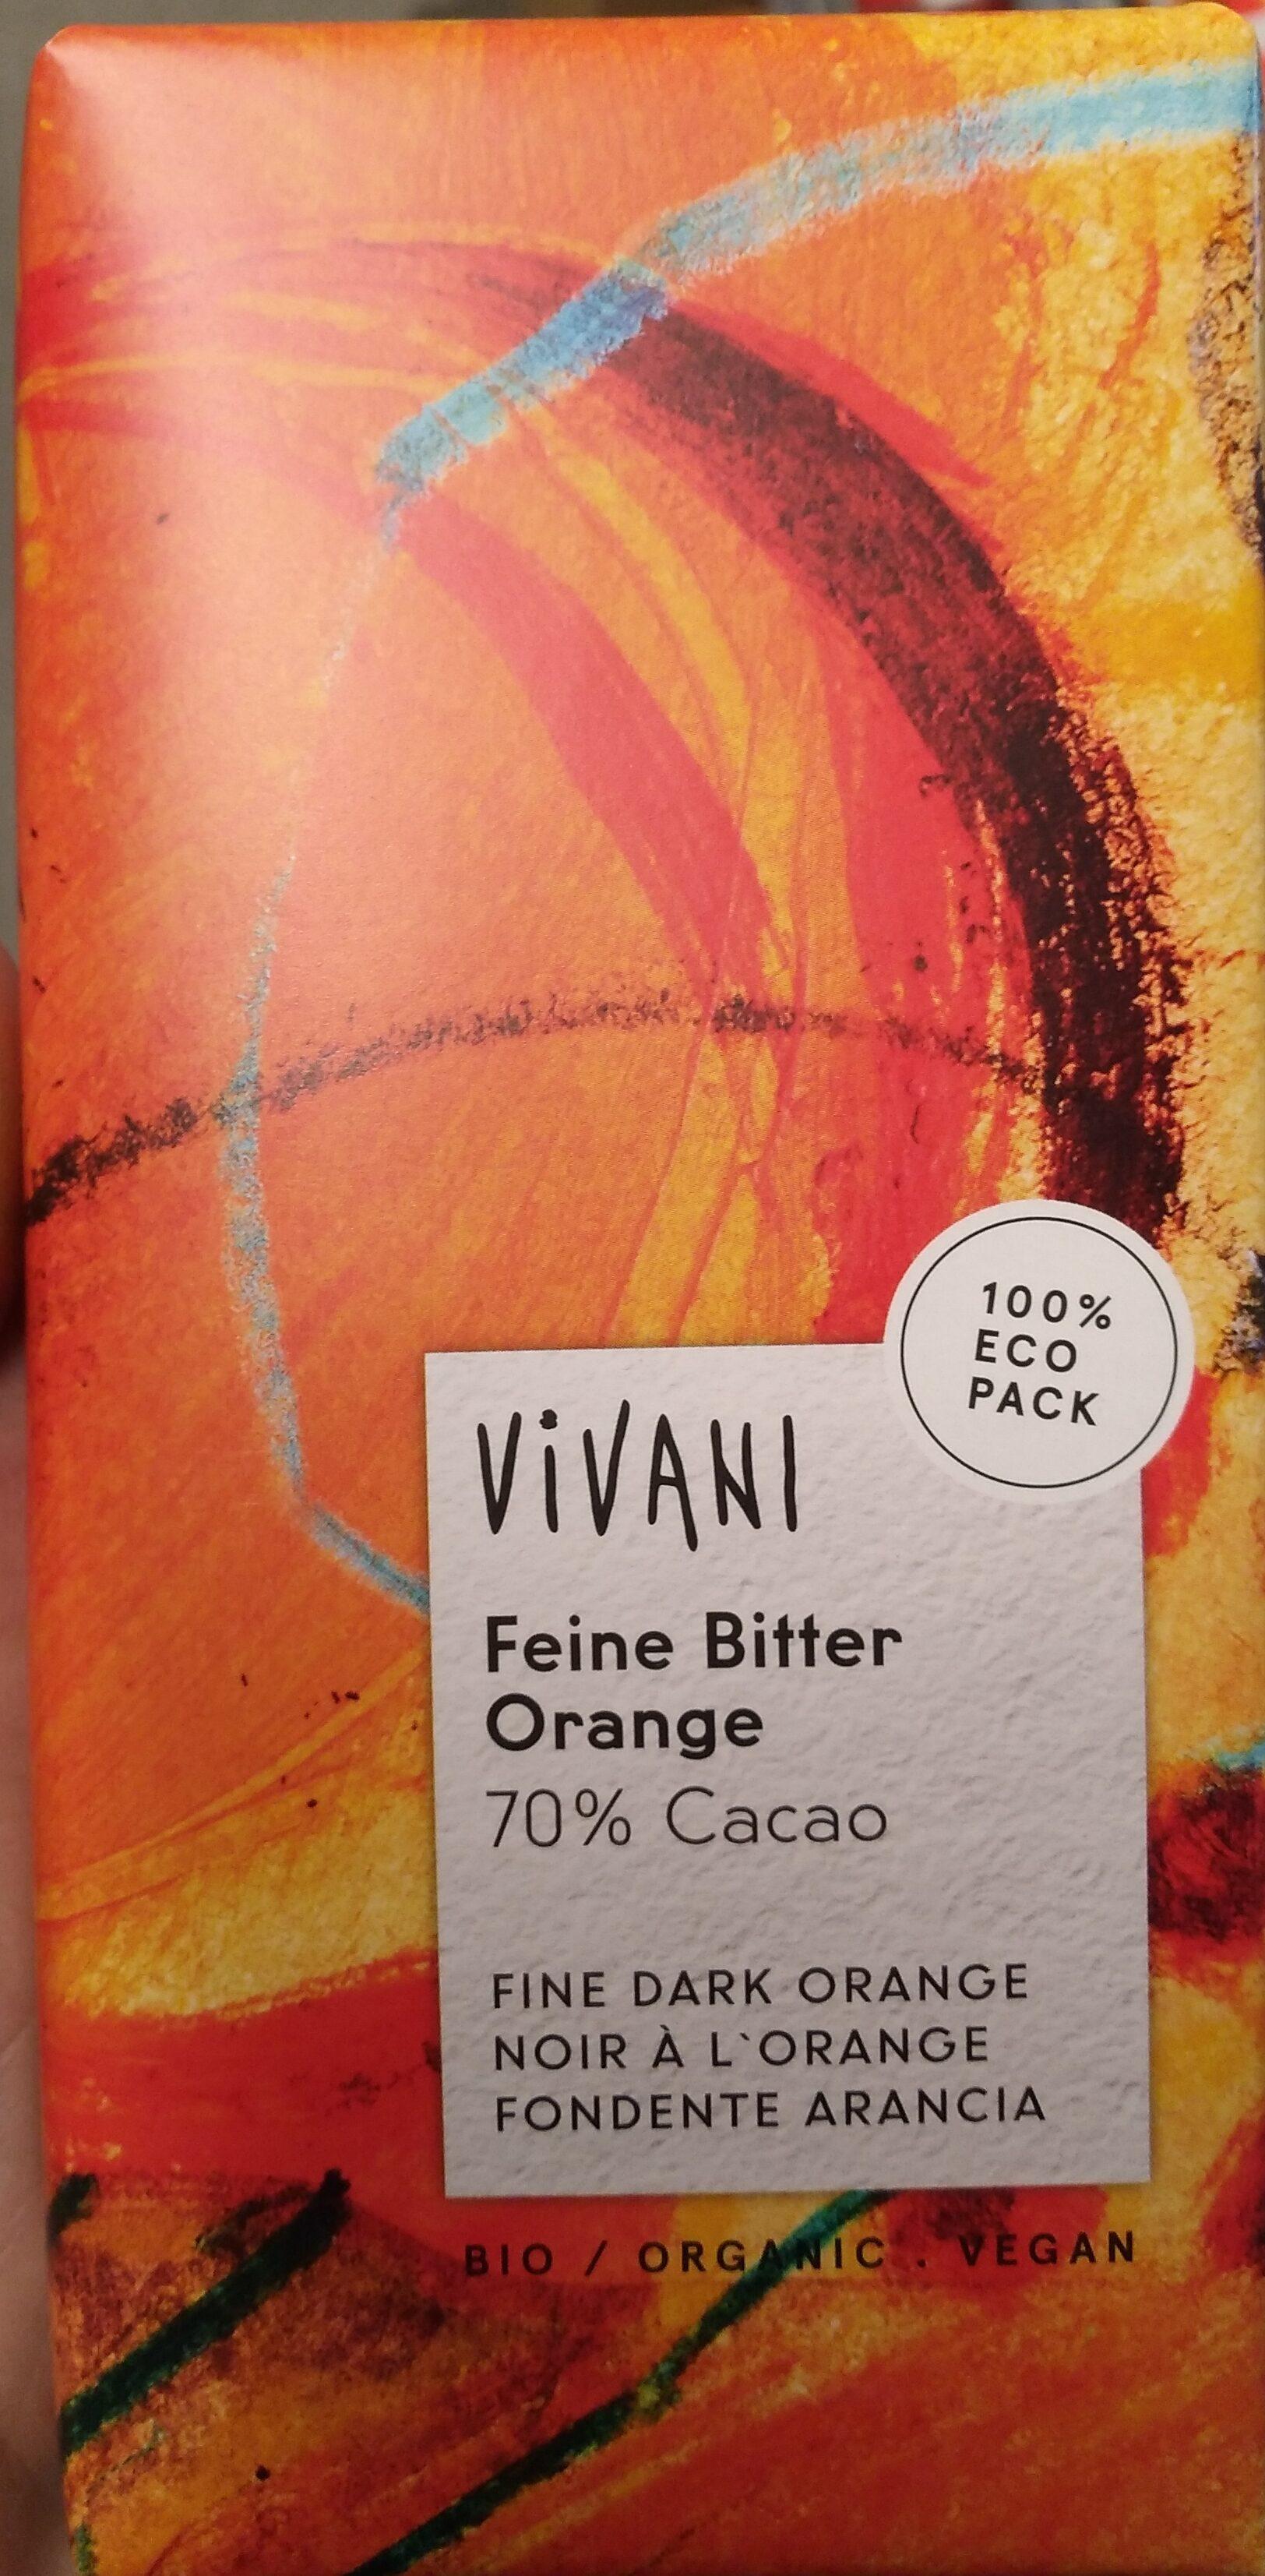 Feine Bitter Orange - Product